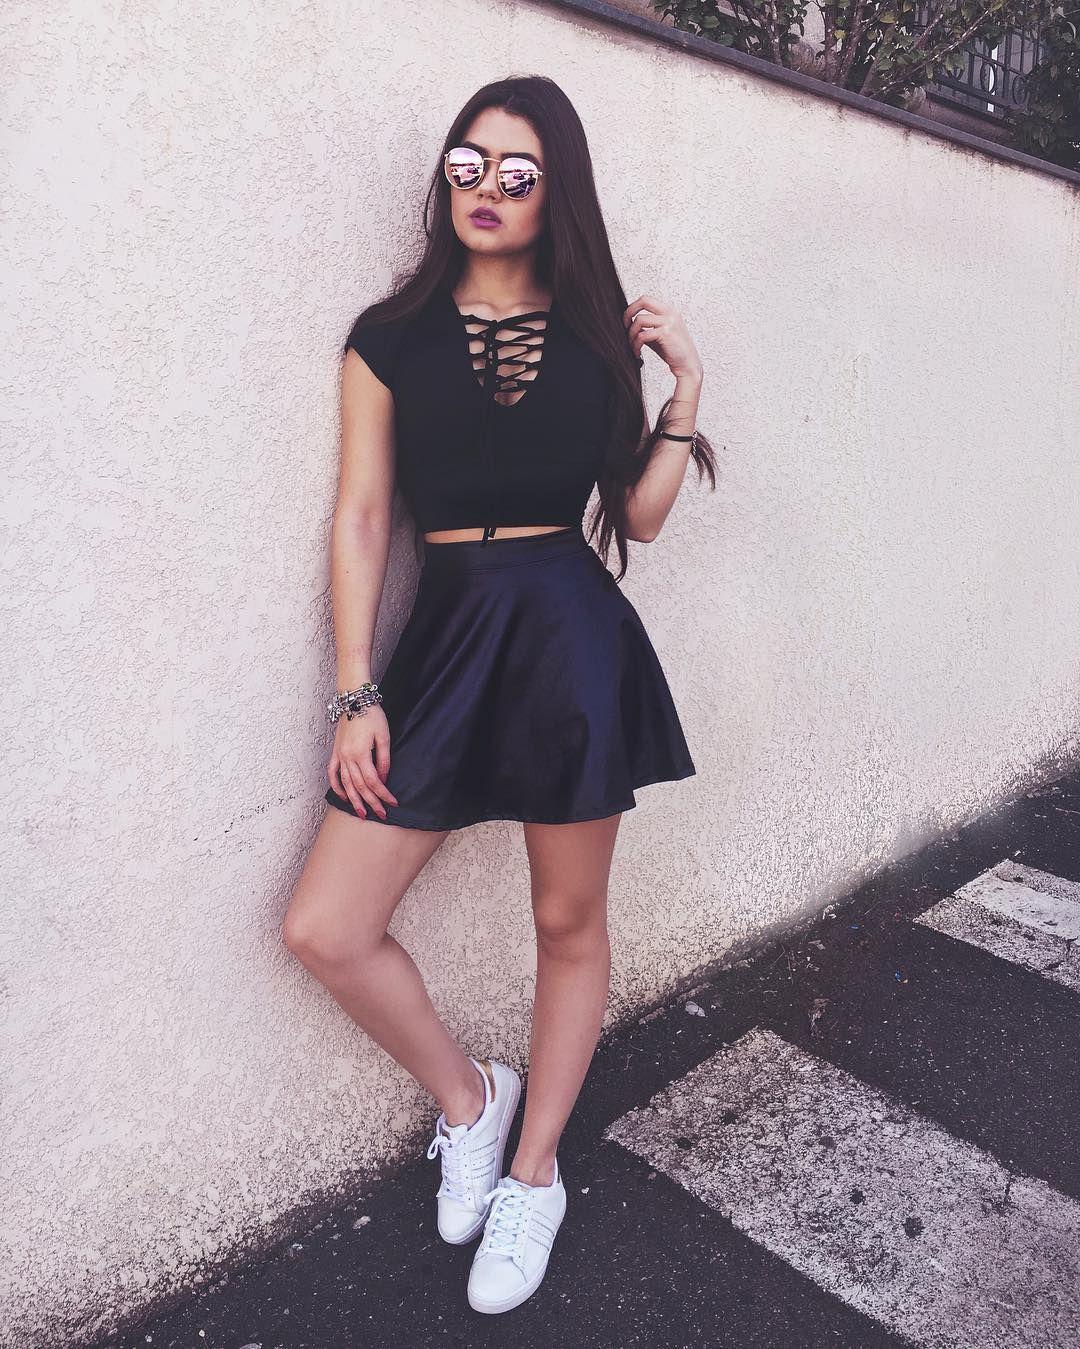 Franciny Ehlke ~ Franciny Ehlke It Girls bloggers Pinterest Ropa, Poses para fotos y Vestiditos